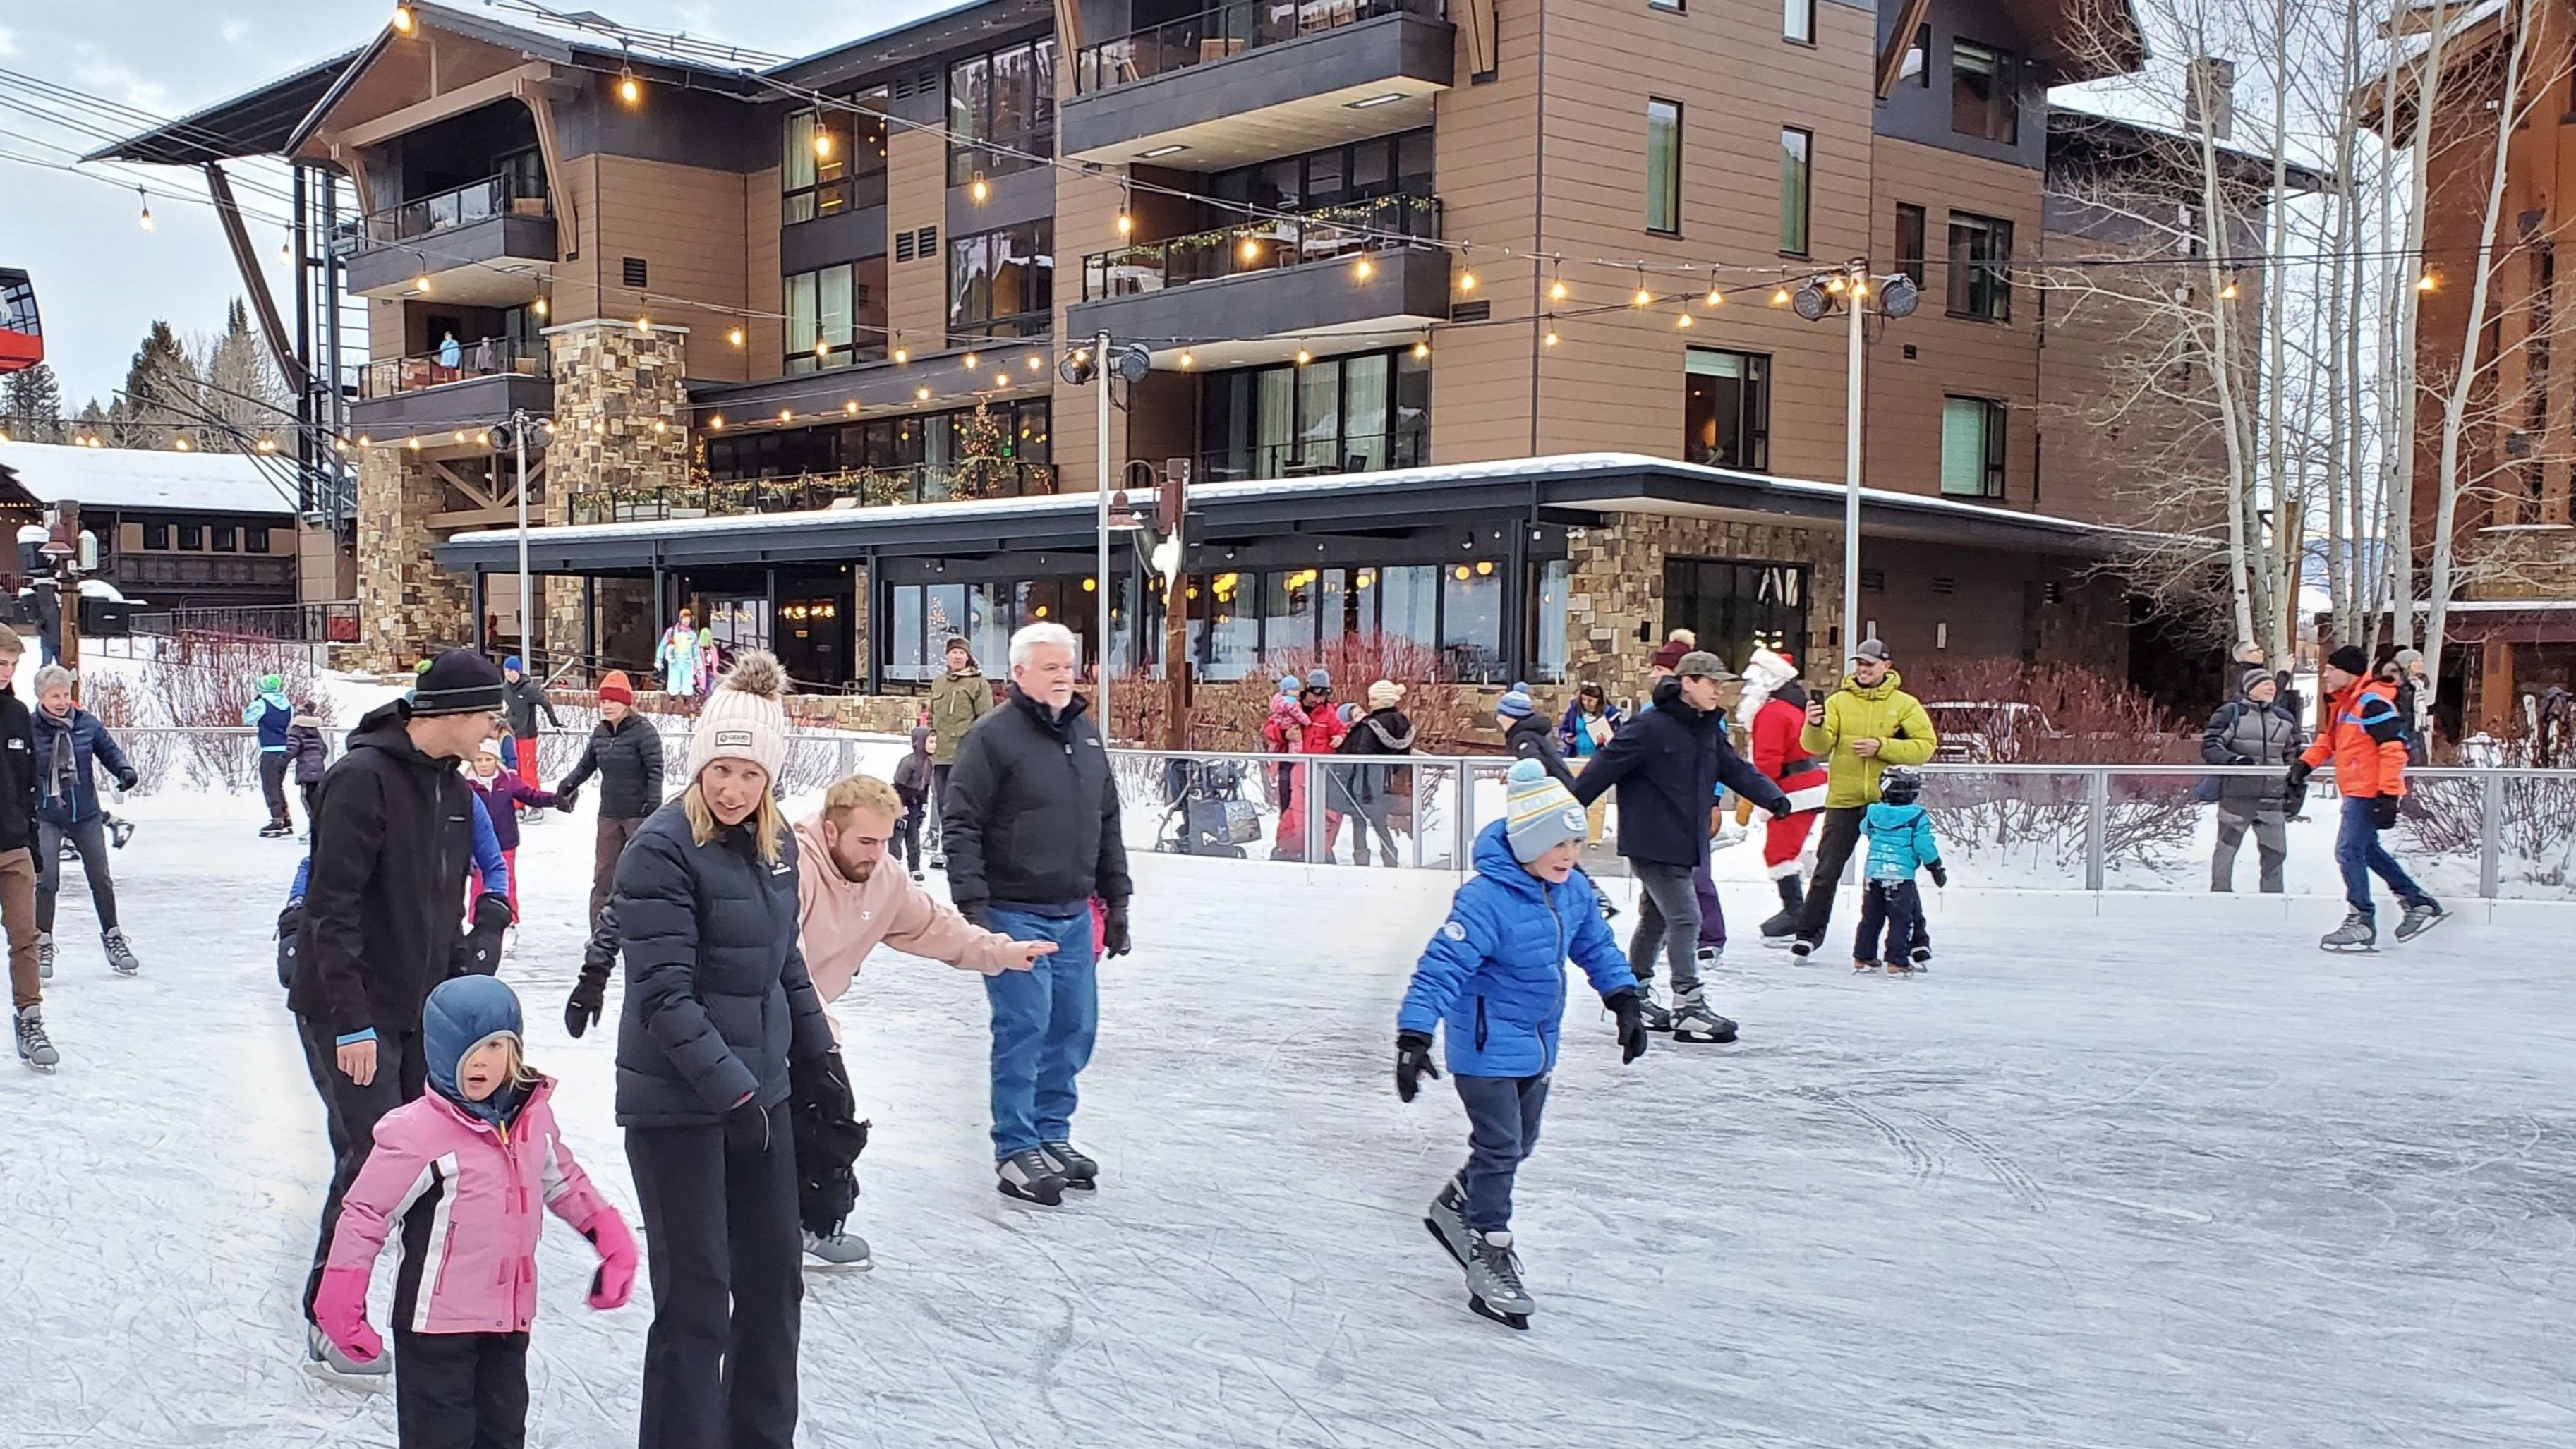 Jackson Hole Winter Wonderland Ice Rinks